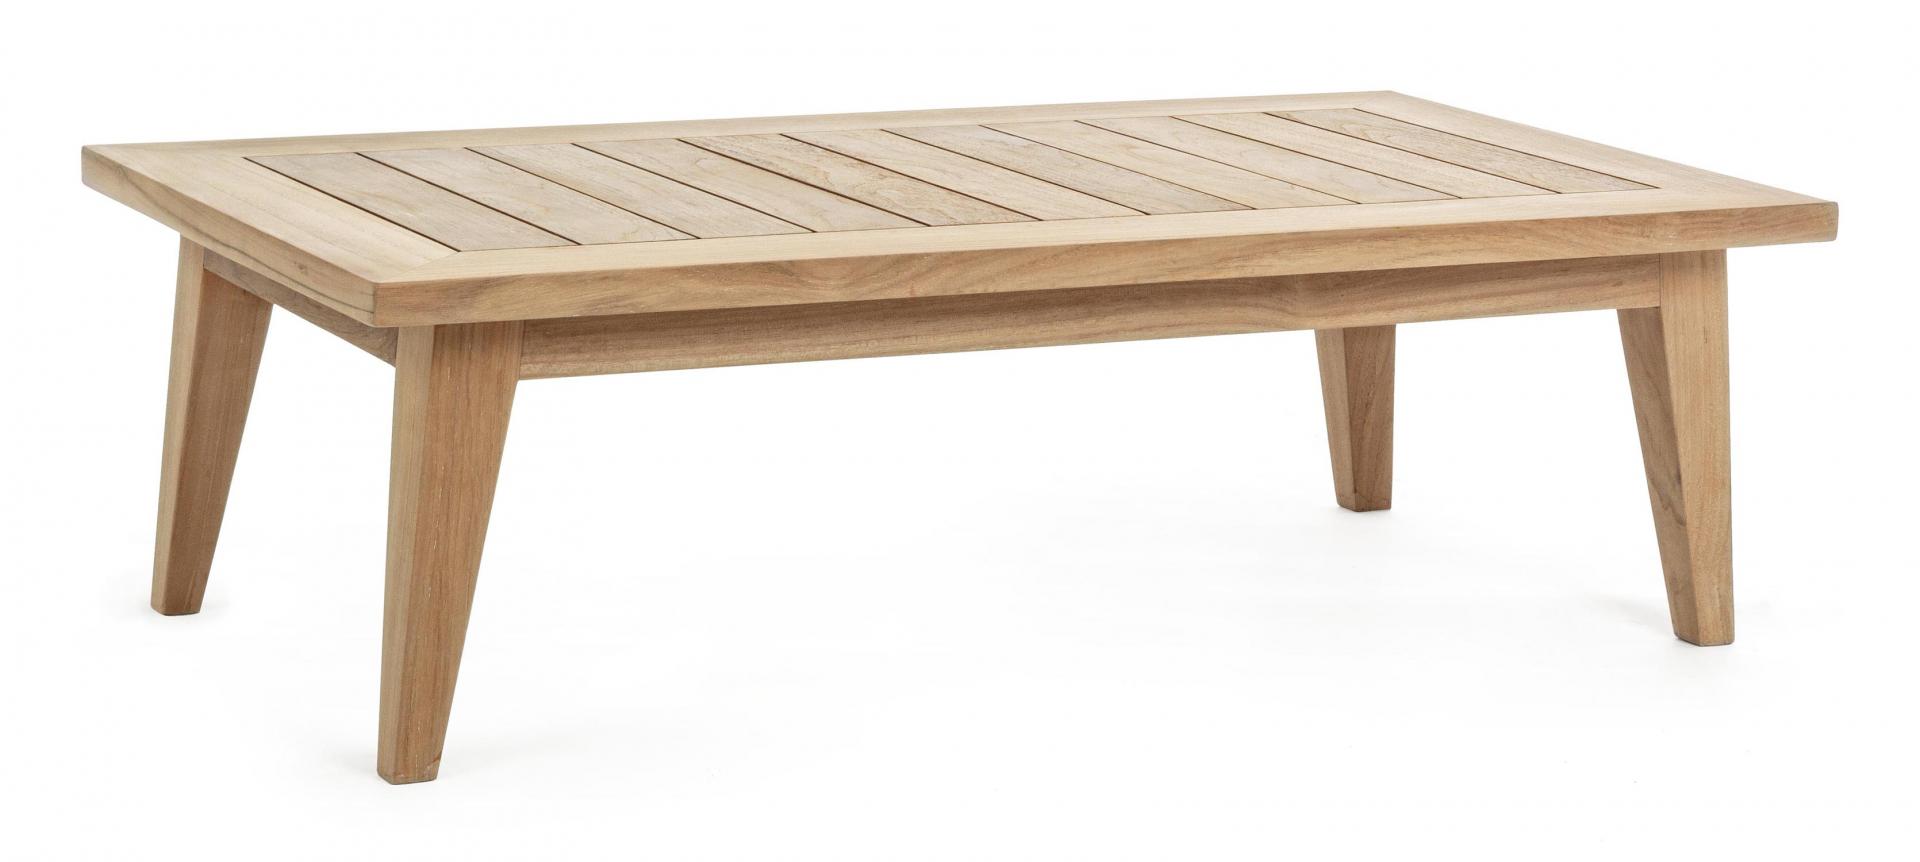 Pop up Home designové stoly Pasadena Table